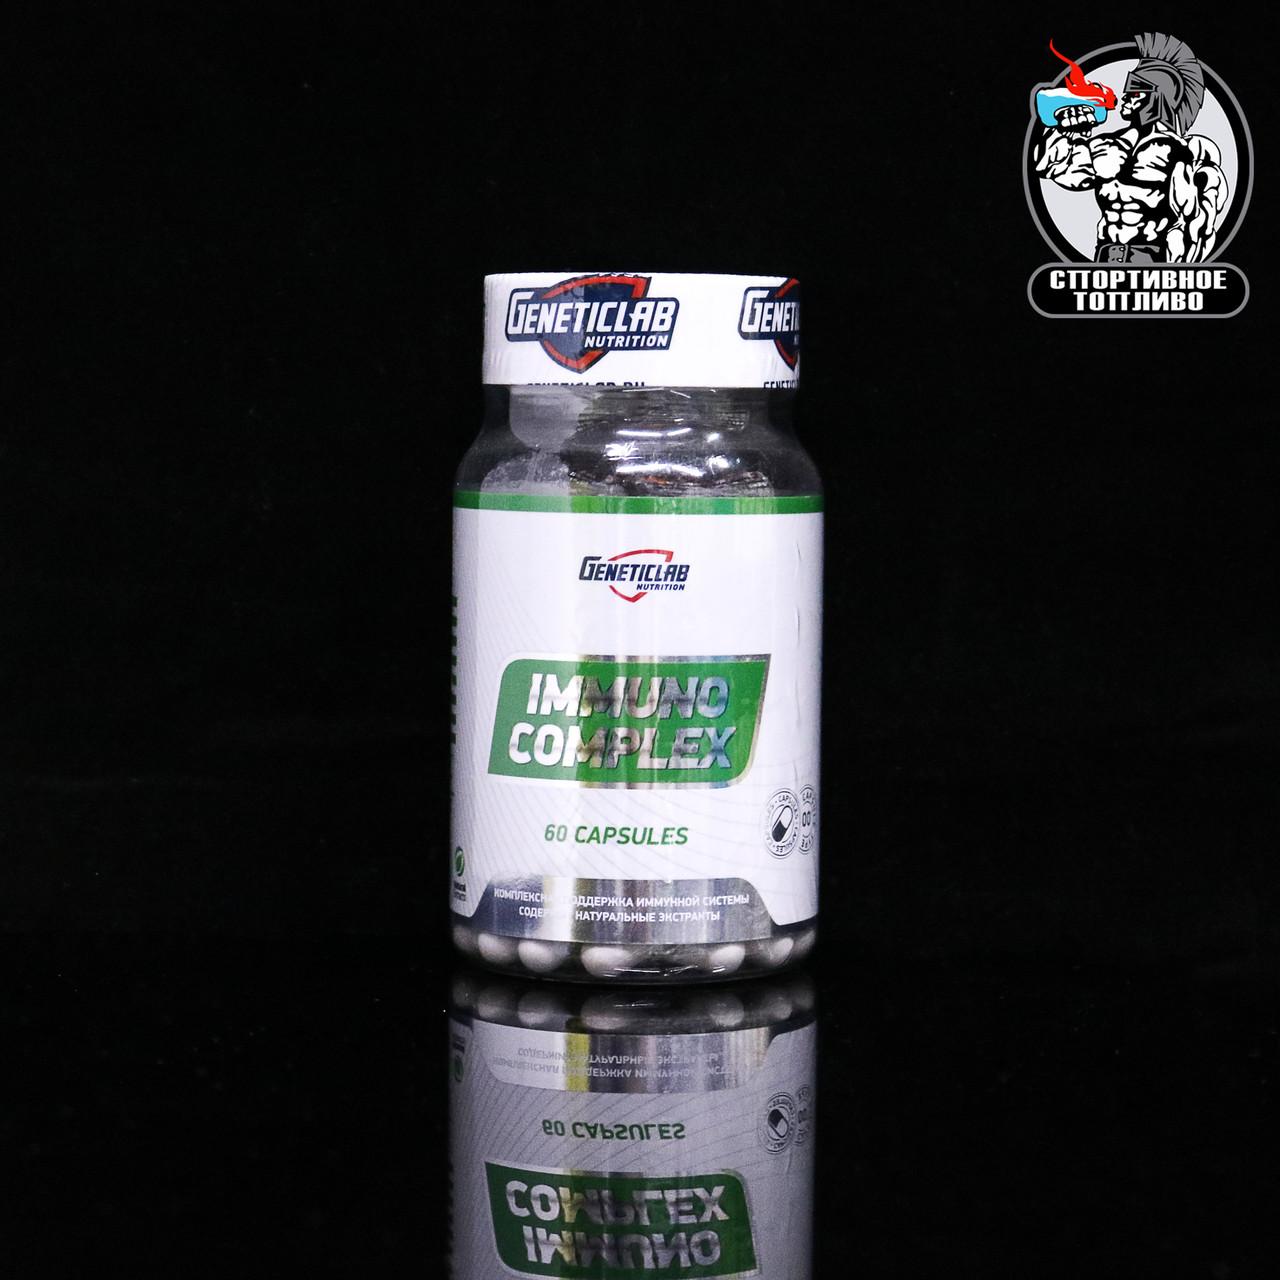 Geneticlab - Immuno complex 60 капс/30 порций